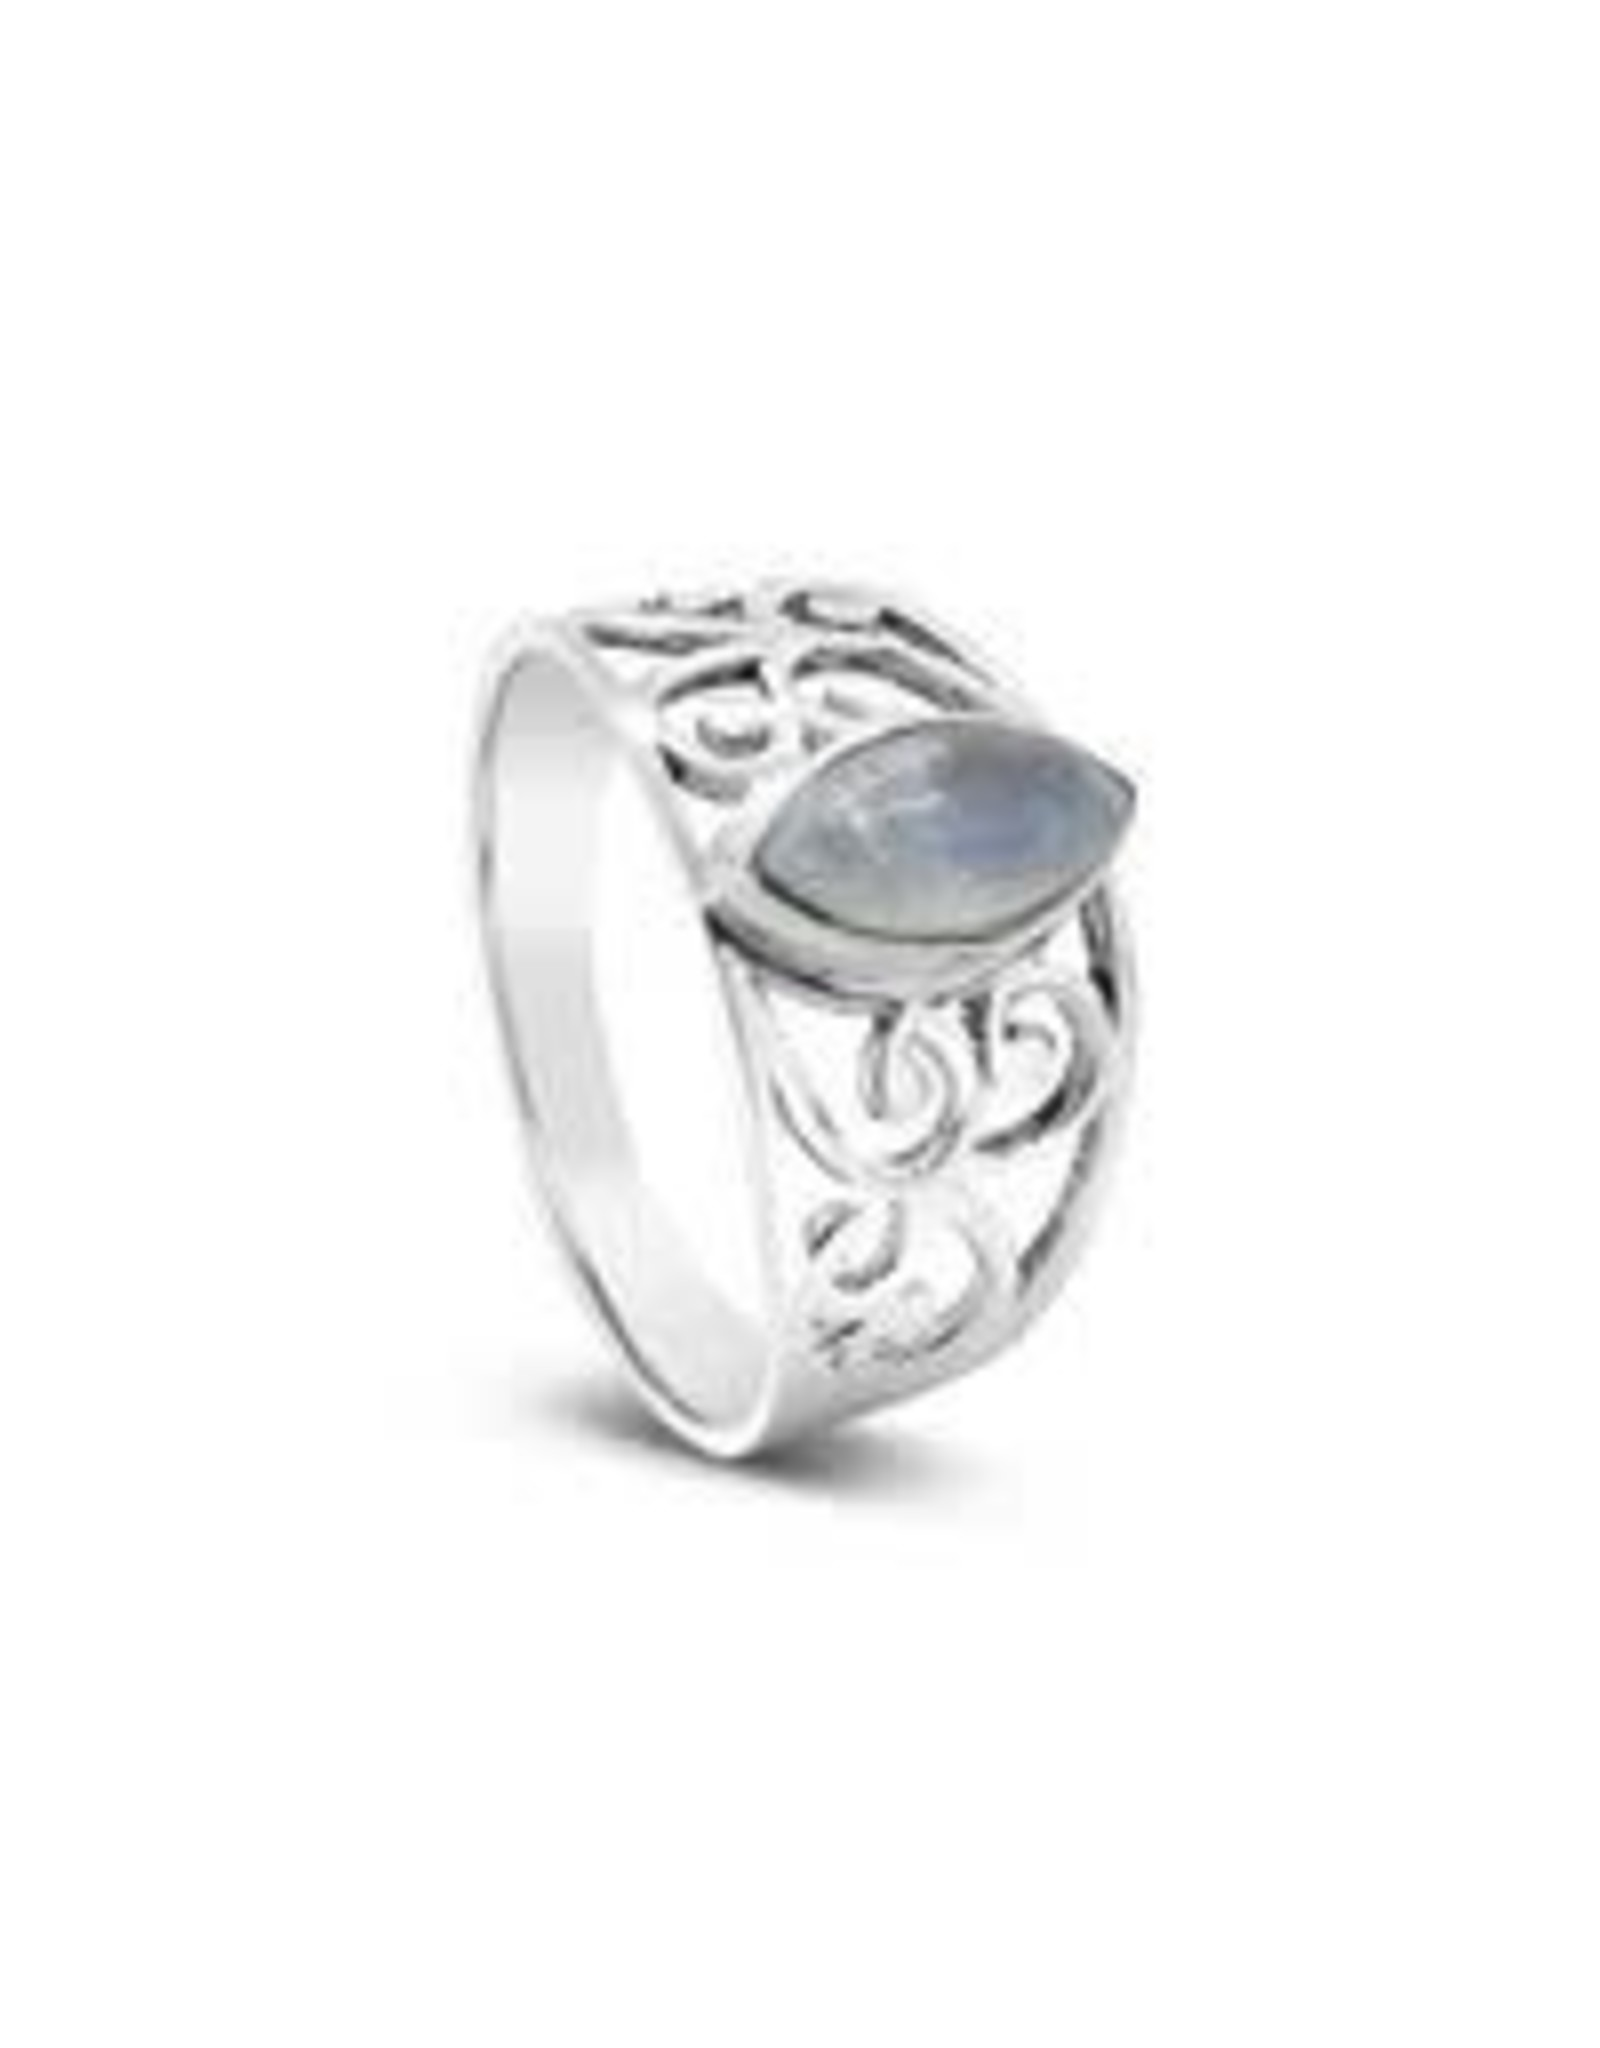 Moonstone Ring 9mm x 7mm